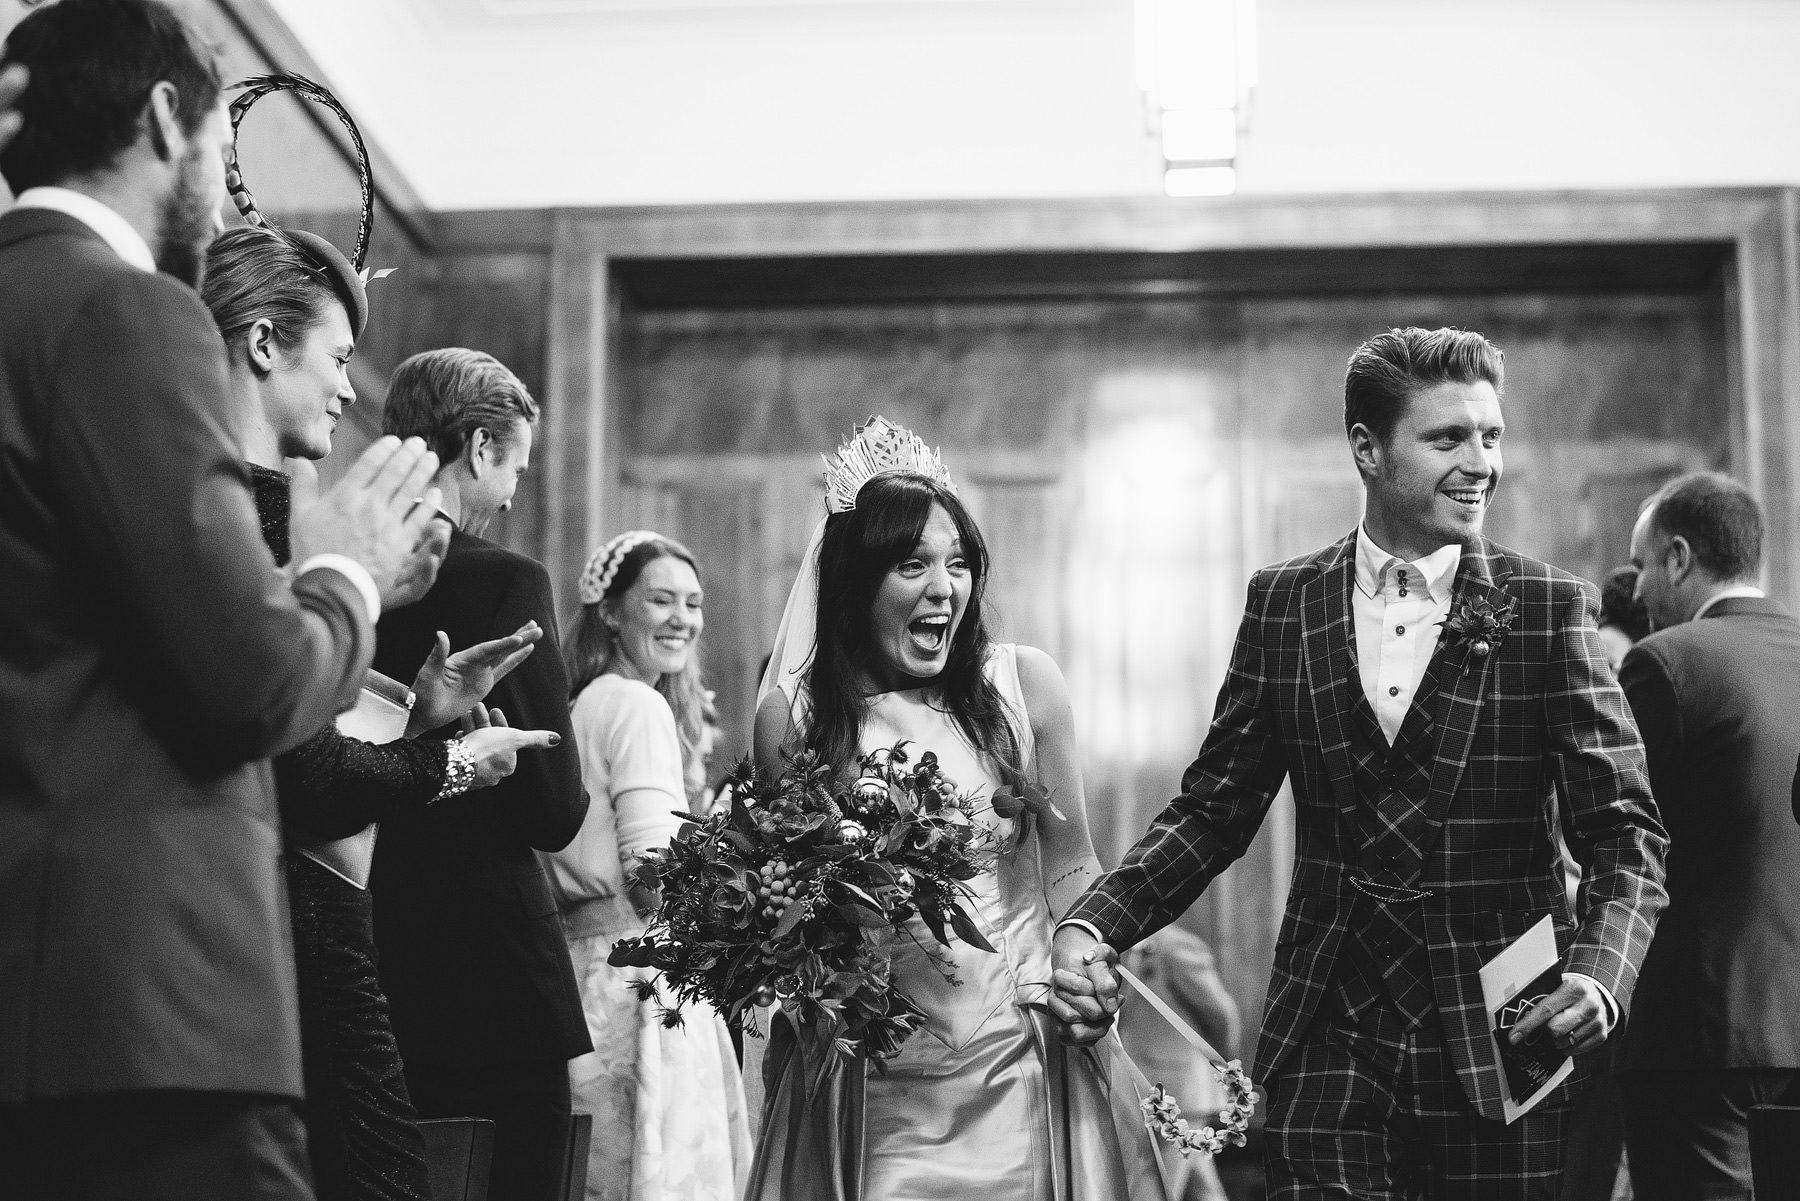 hackney town hall weddings